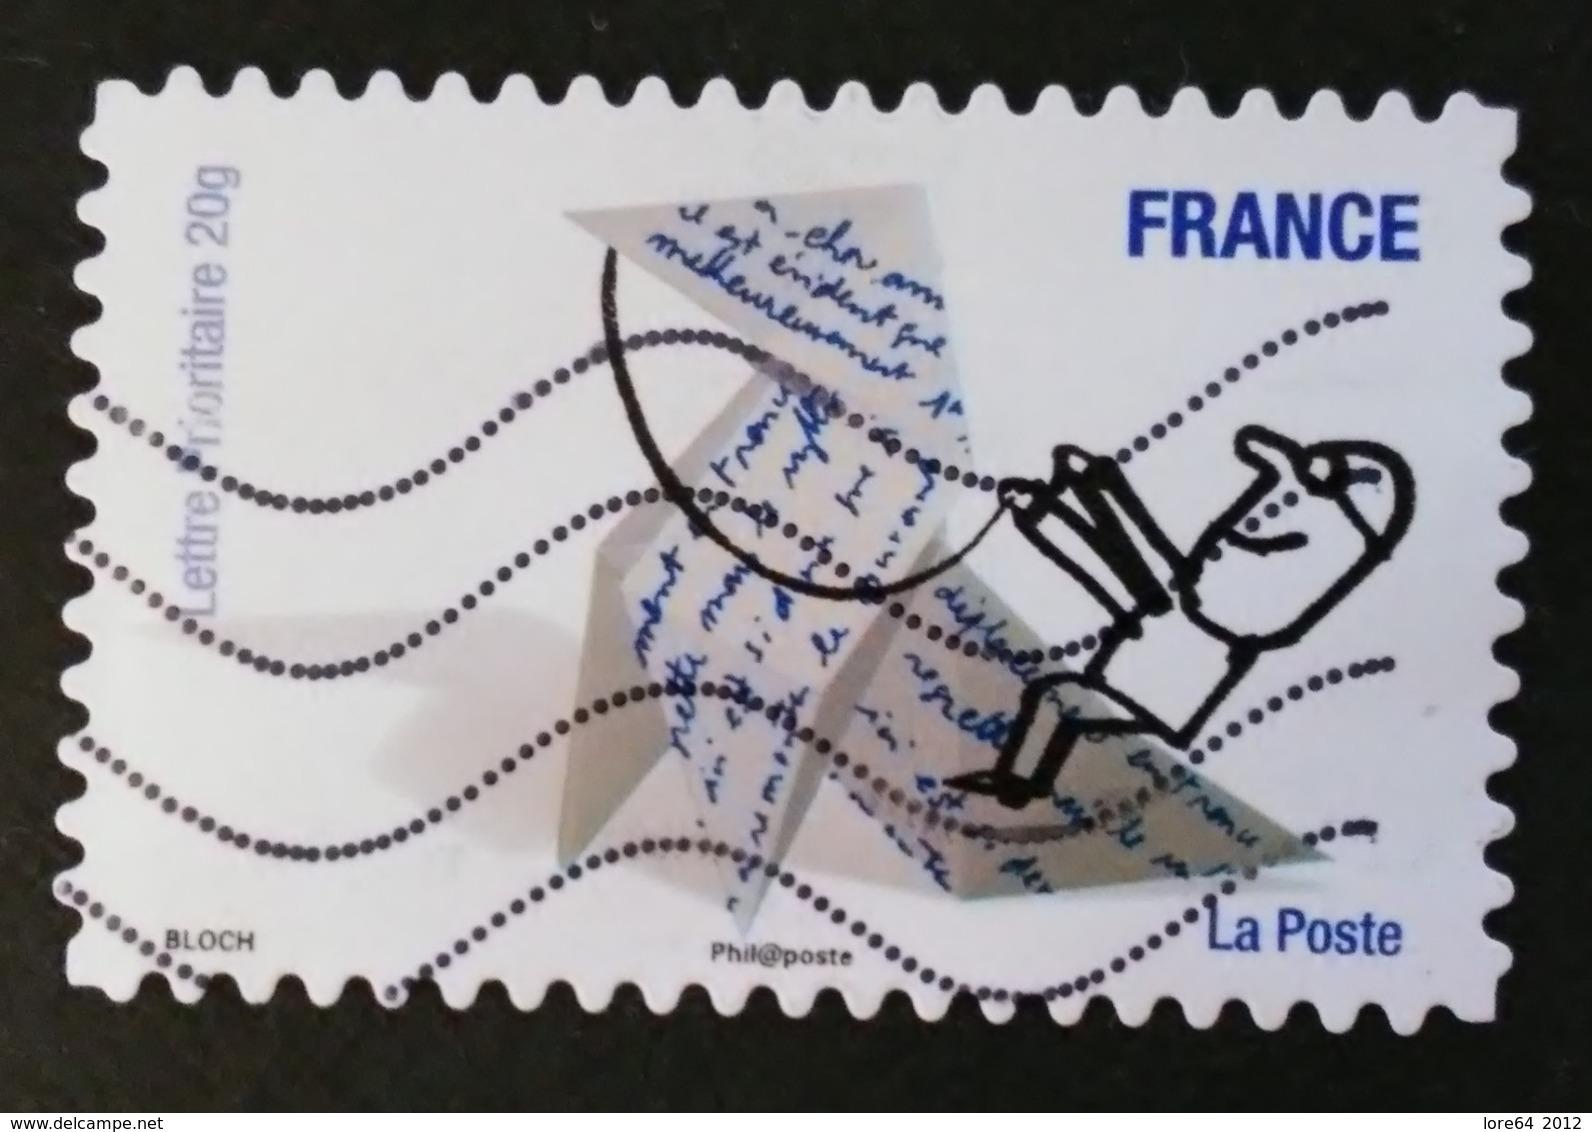 FRANCIA 2010 - 475 - Adhésifs (autocollants)